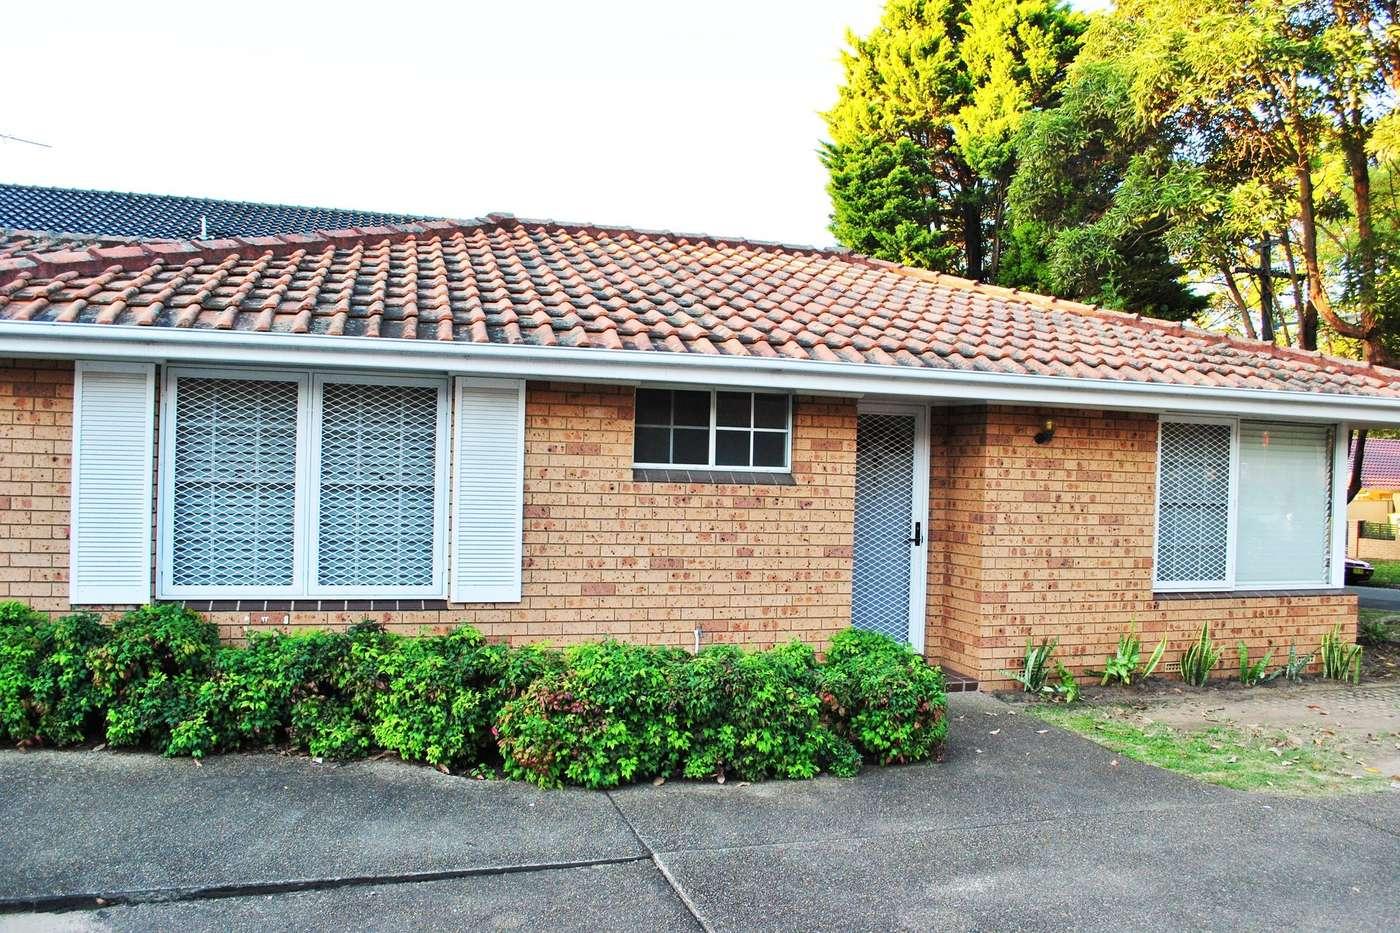 Main view of Homely villa listing, 5/39 Cross Street, Strathfield, NSW 2135